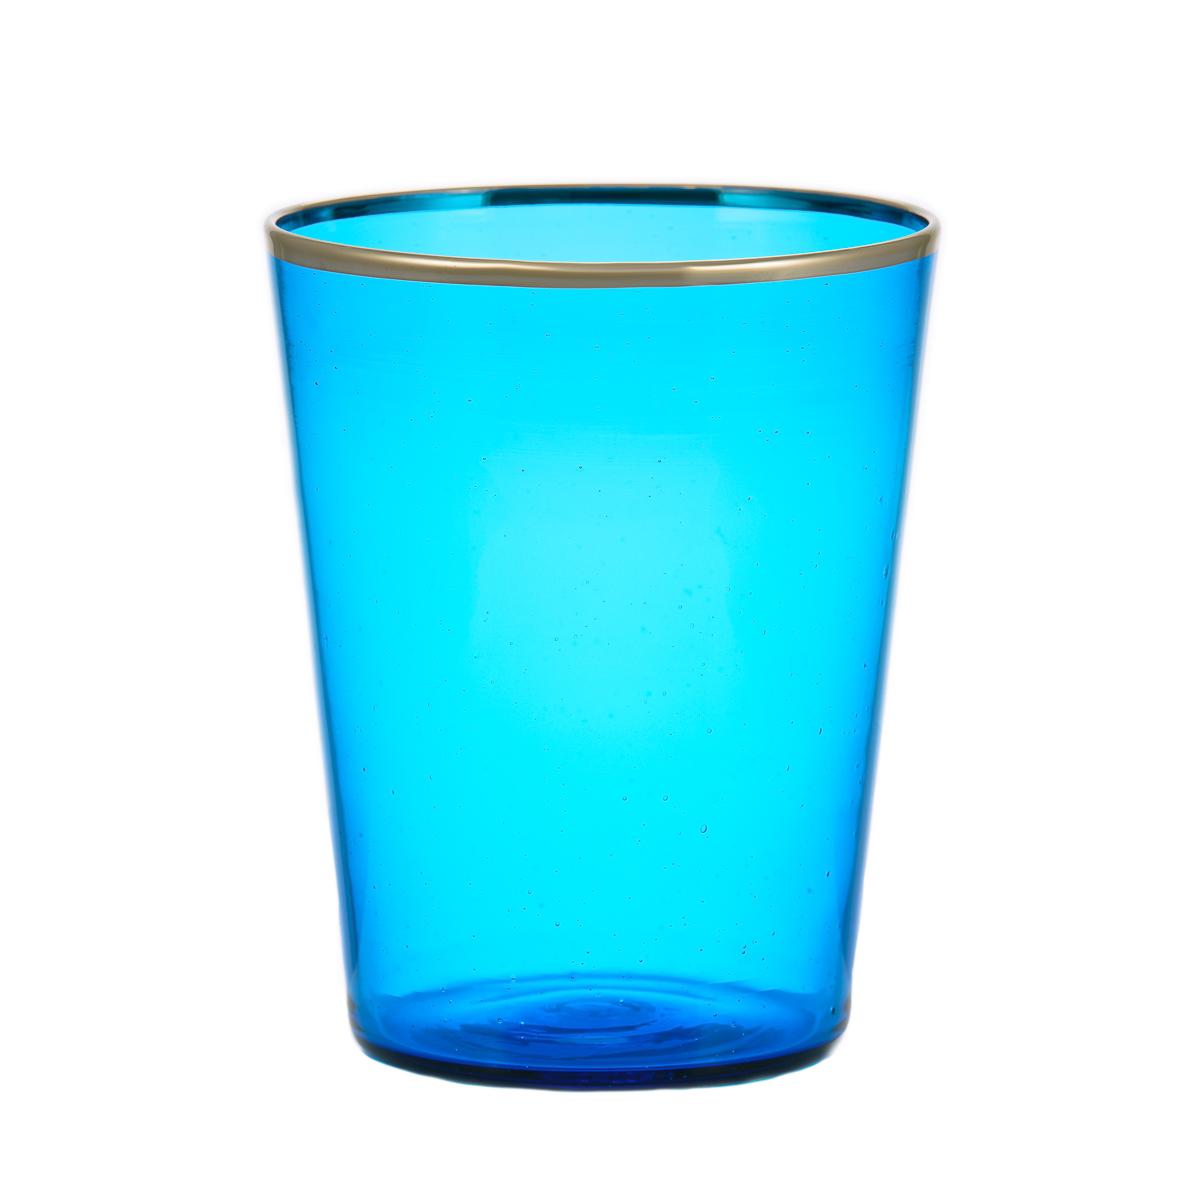 vaso-glass-giberto-colorful-platinum-design-water-wine-acquamare-luxury